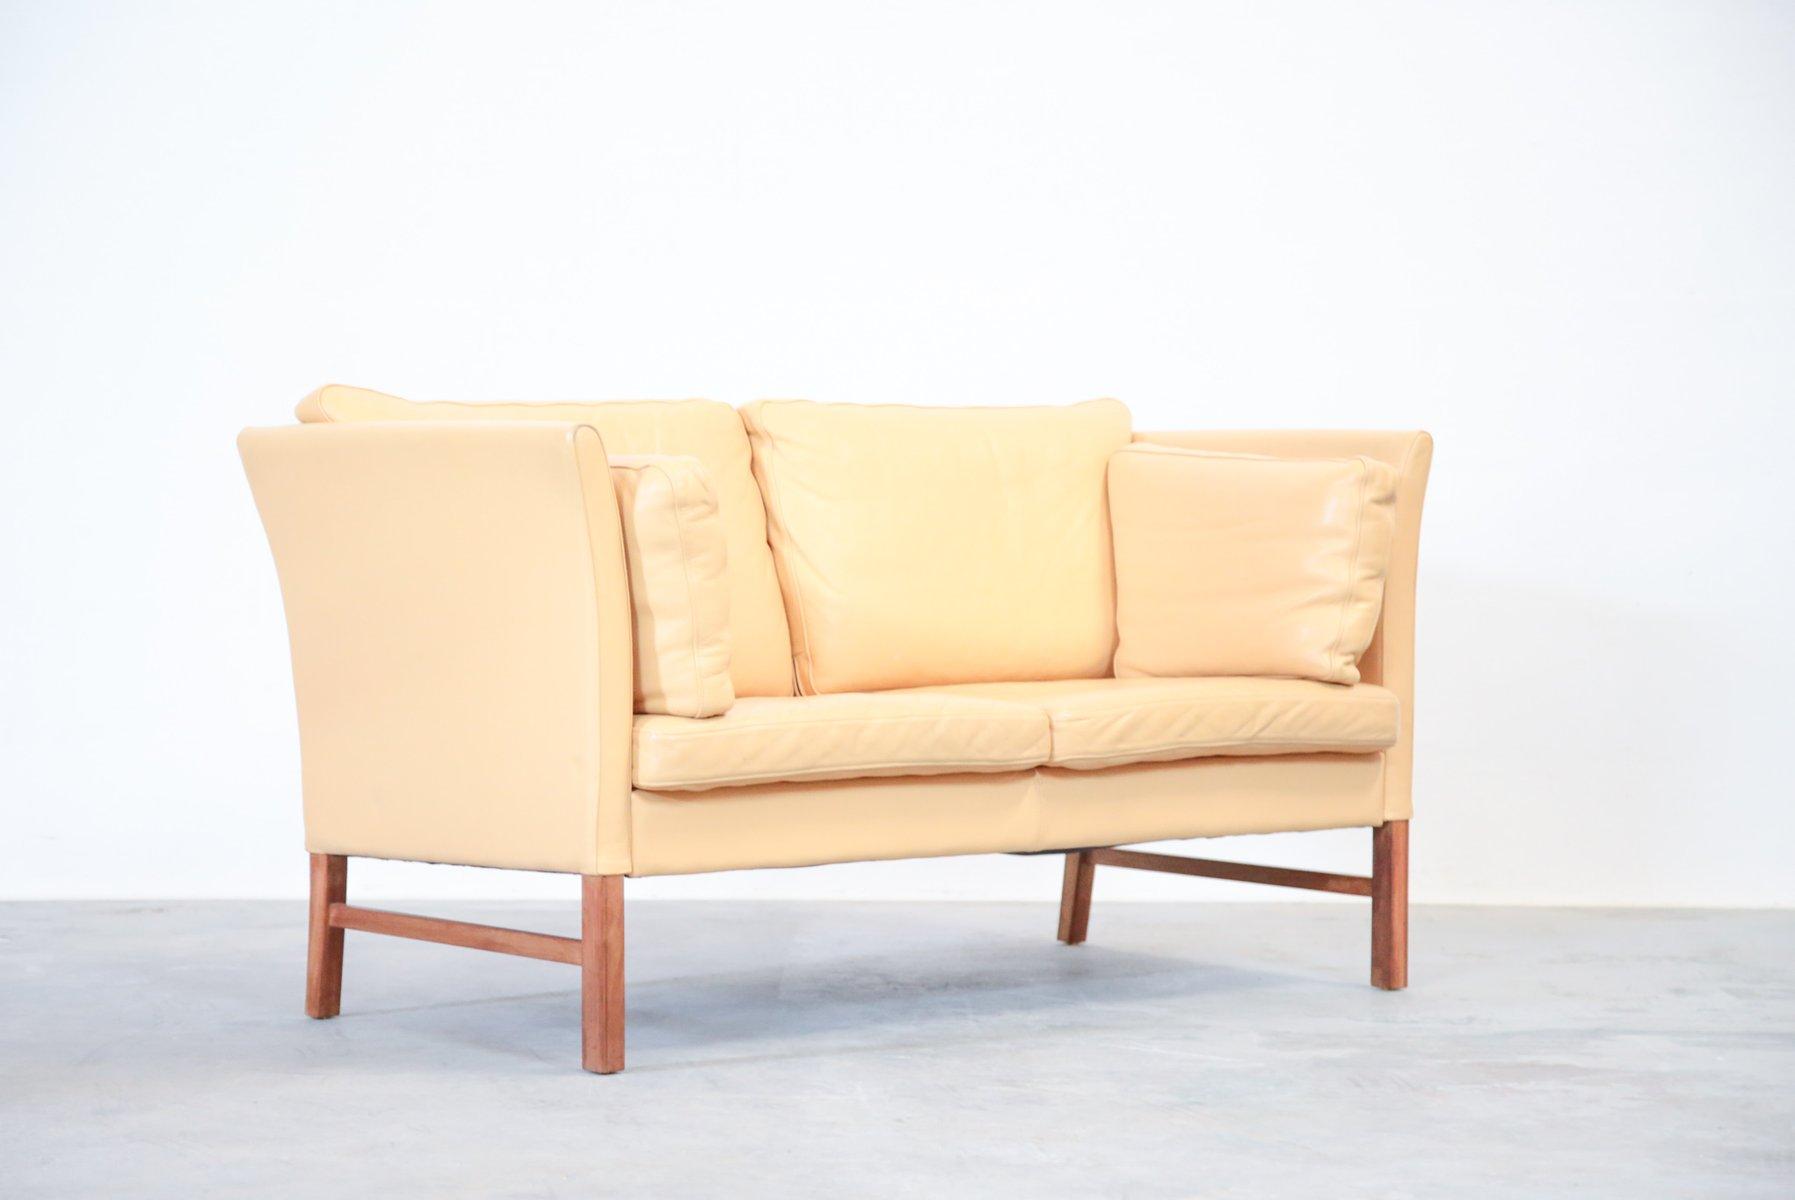 d nisches 2 sitzer ledersofa in beige 1970er bei pamono. Black Bedroom Furniture Sets. Home Design Ideas